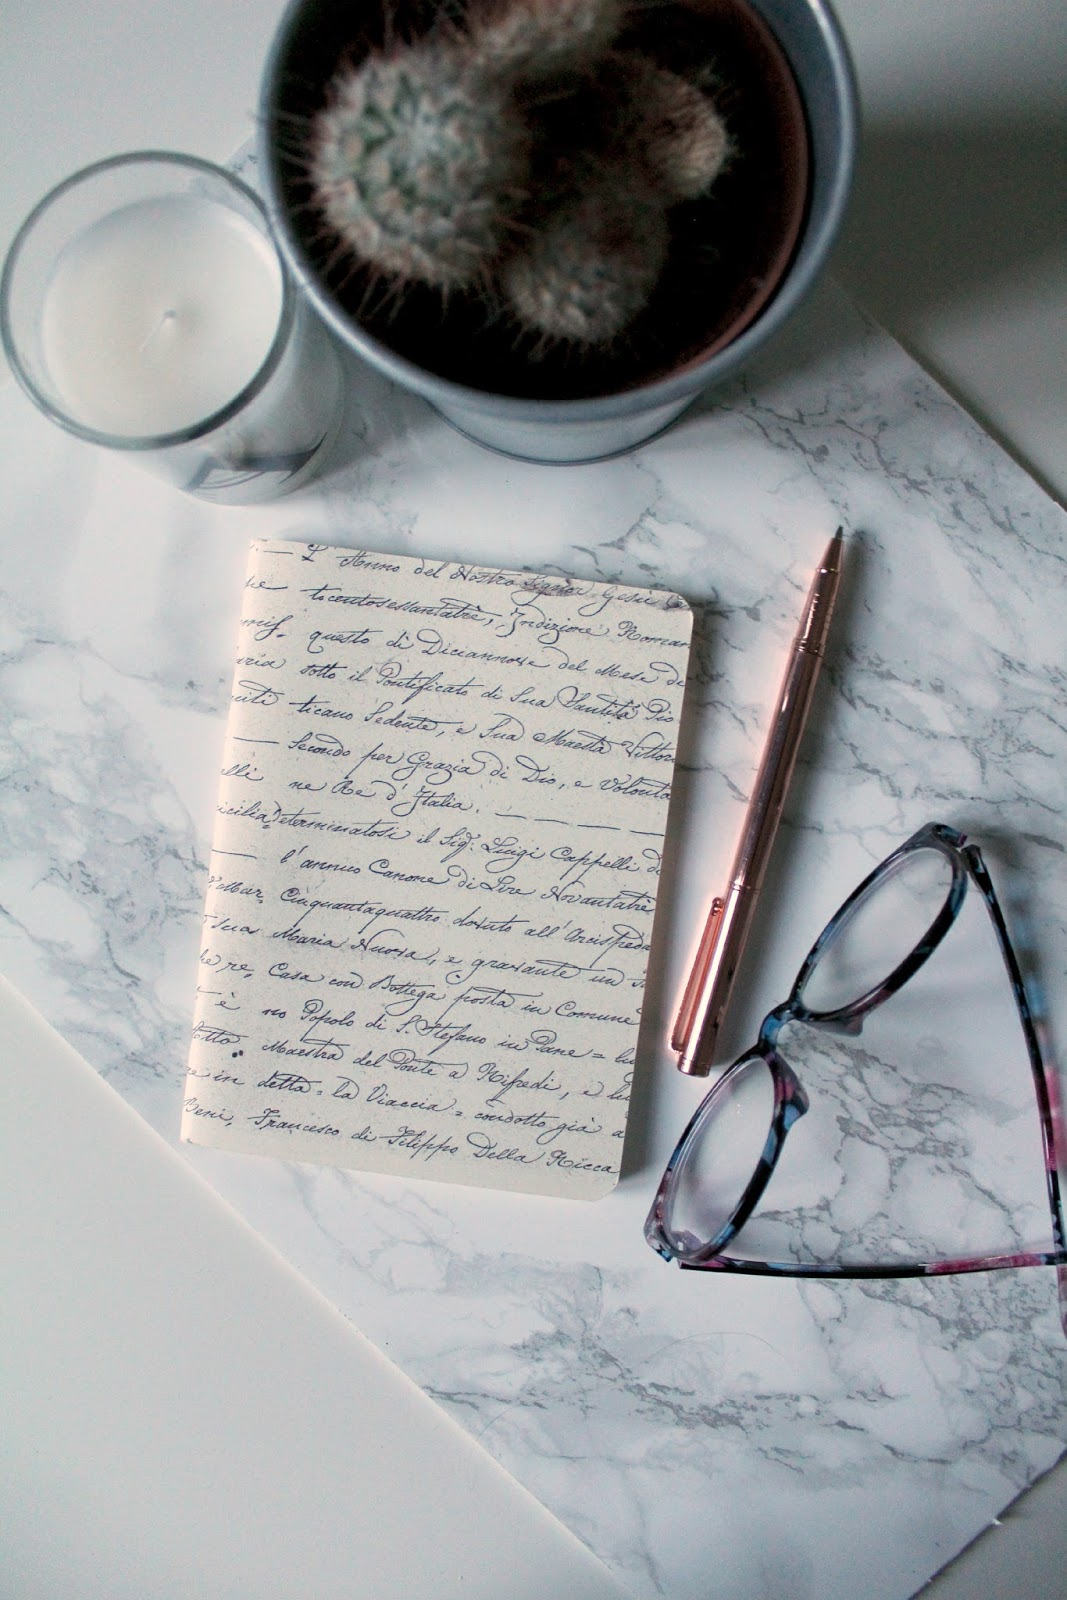 blogging tips, blogging ideas, blog posts, blog post ideas, 476 blog post ideas, beauty post ideas, lifestyle post ideas, style post ideas, tattoo blogging ideas, comic and gaming post ideas, blogging post ideas